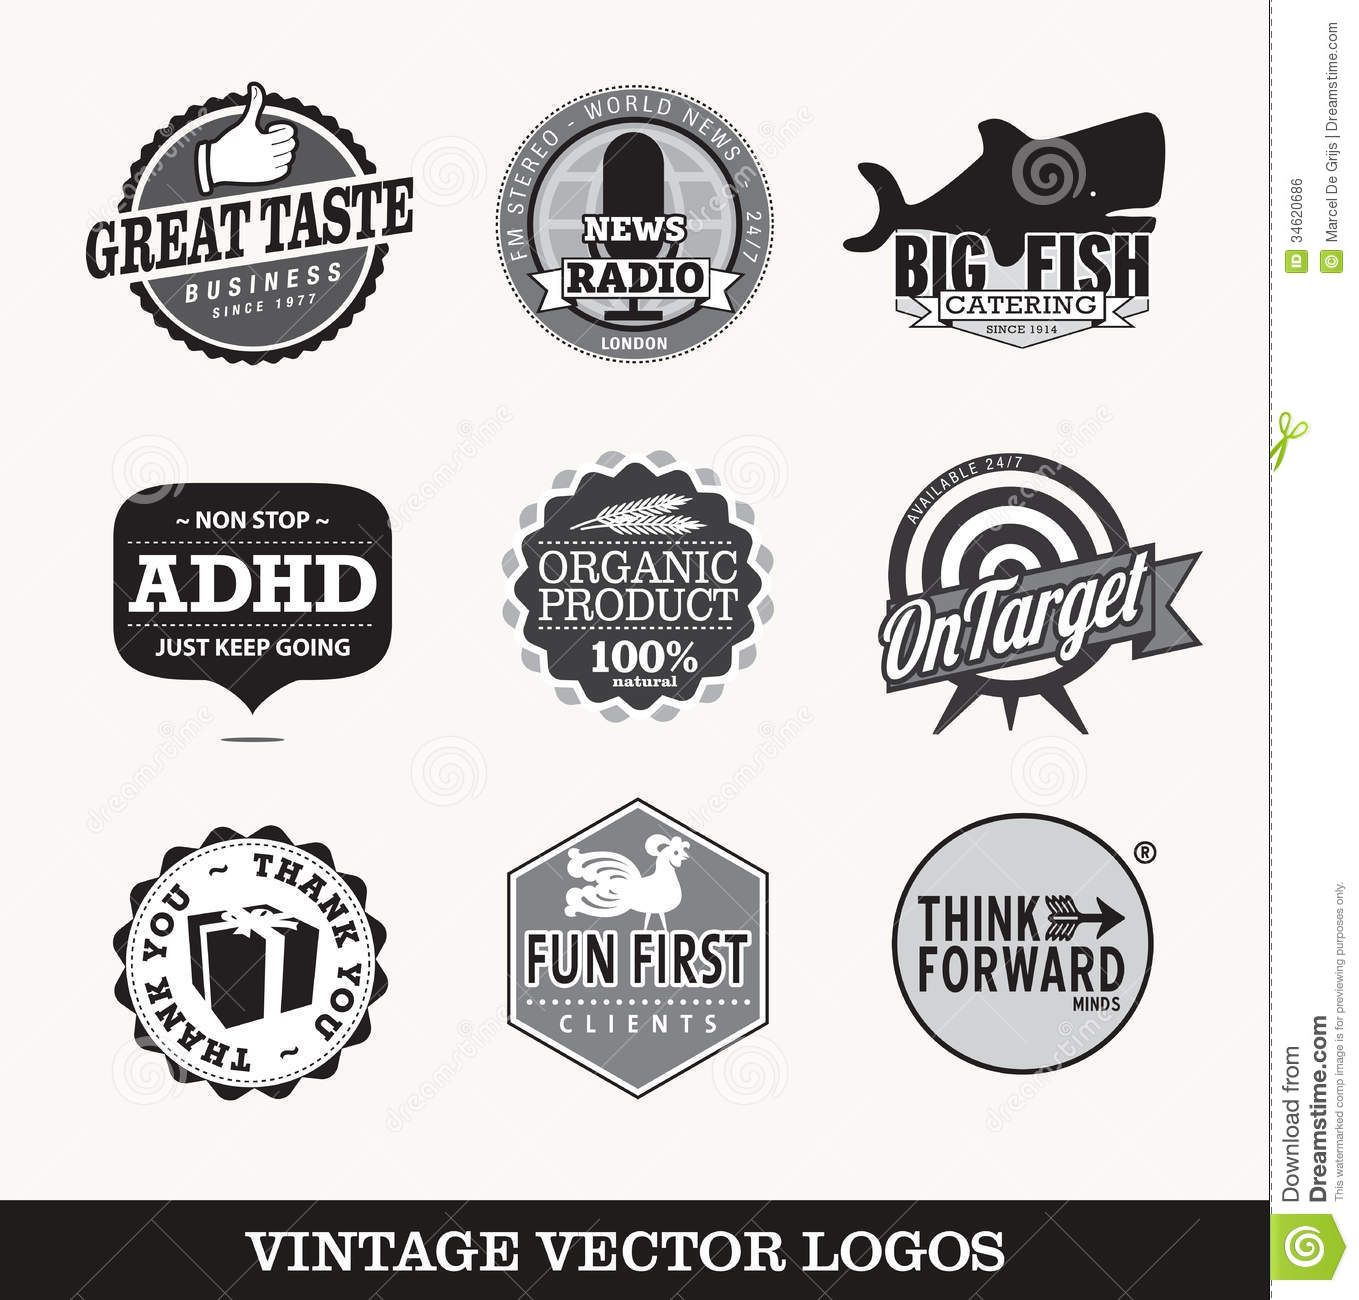 Pin By Jennifer Tran On Graphic Design Ideas Vintage Logo Design Vintage Logo Vector Logo